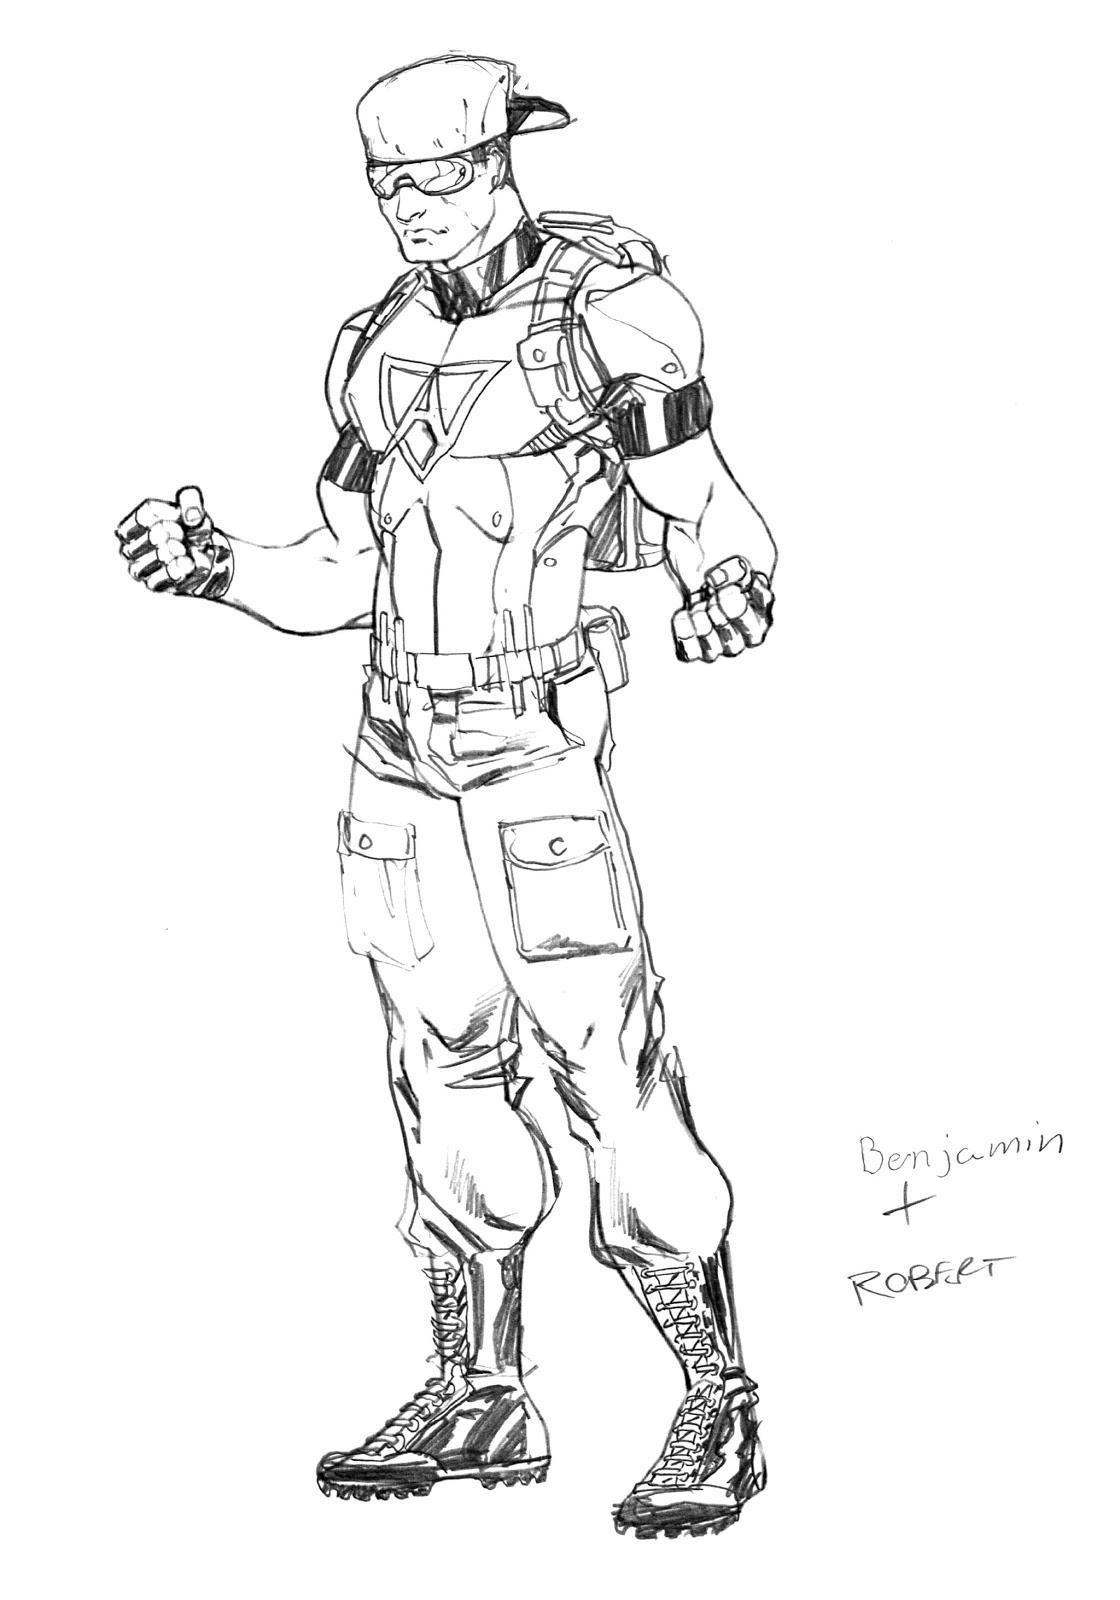 Robert Atkins Art Character Creation